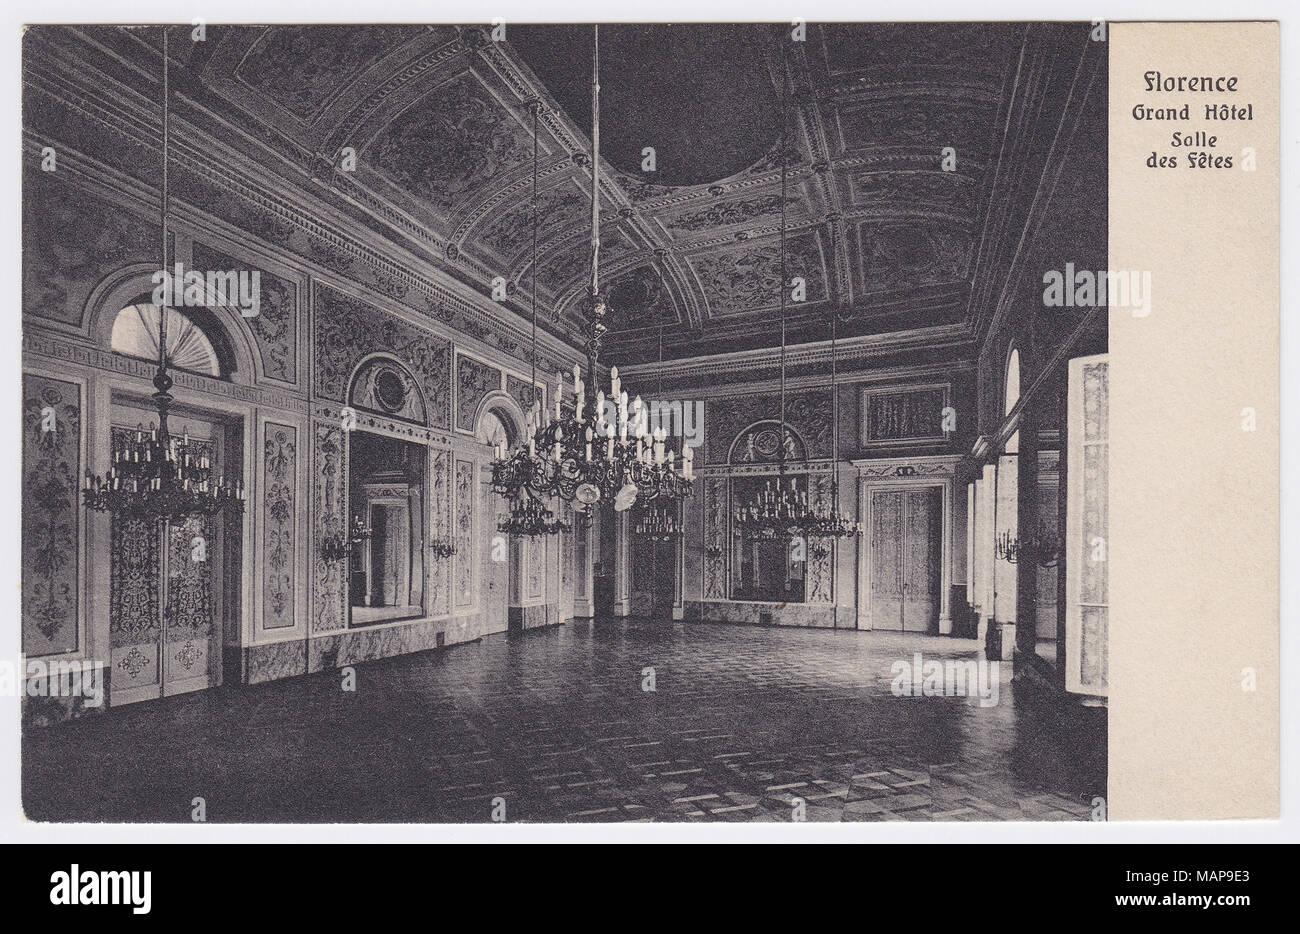 Grand Hotel, Florence, Italy, Ballroom - Stock Image